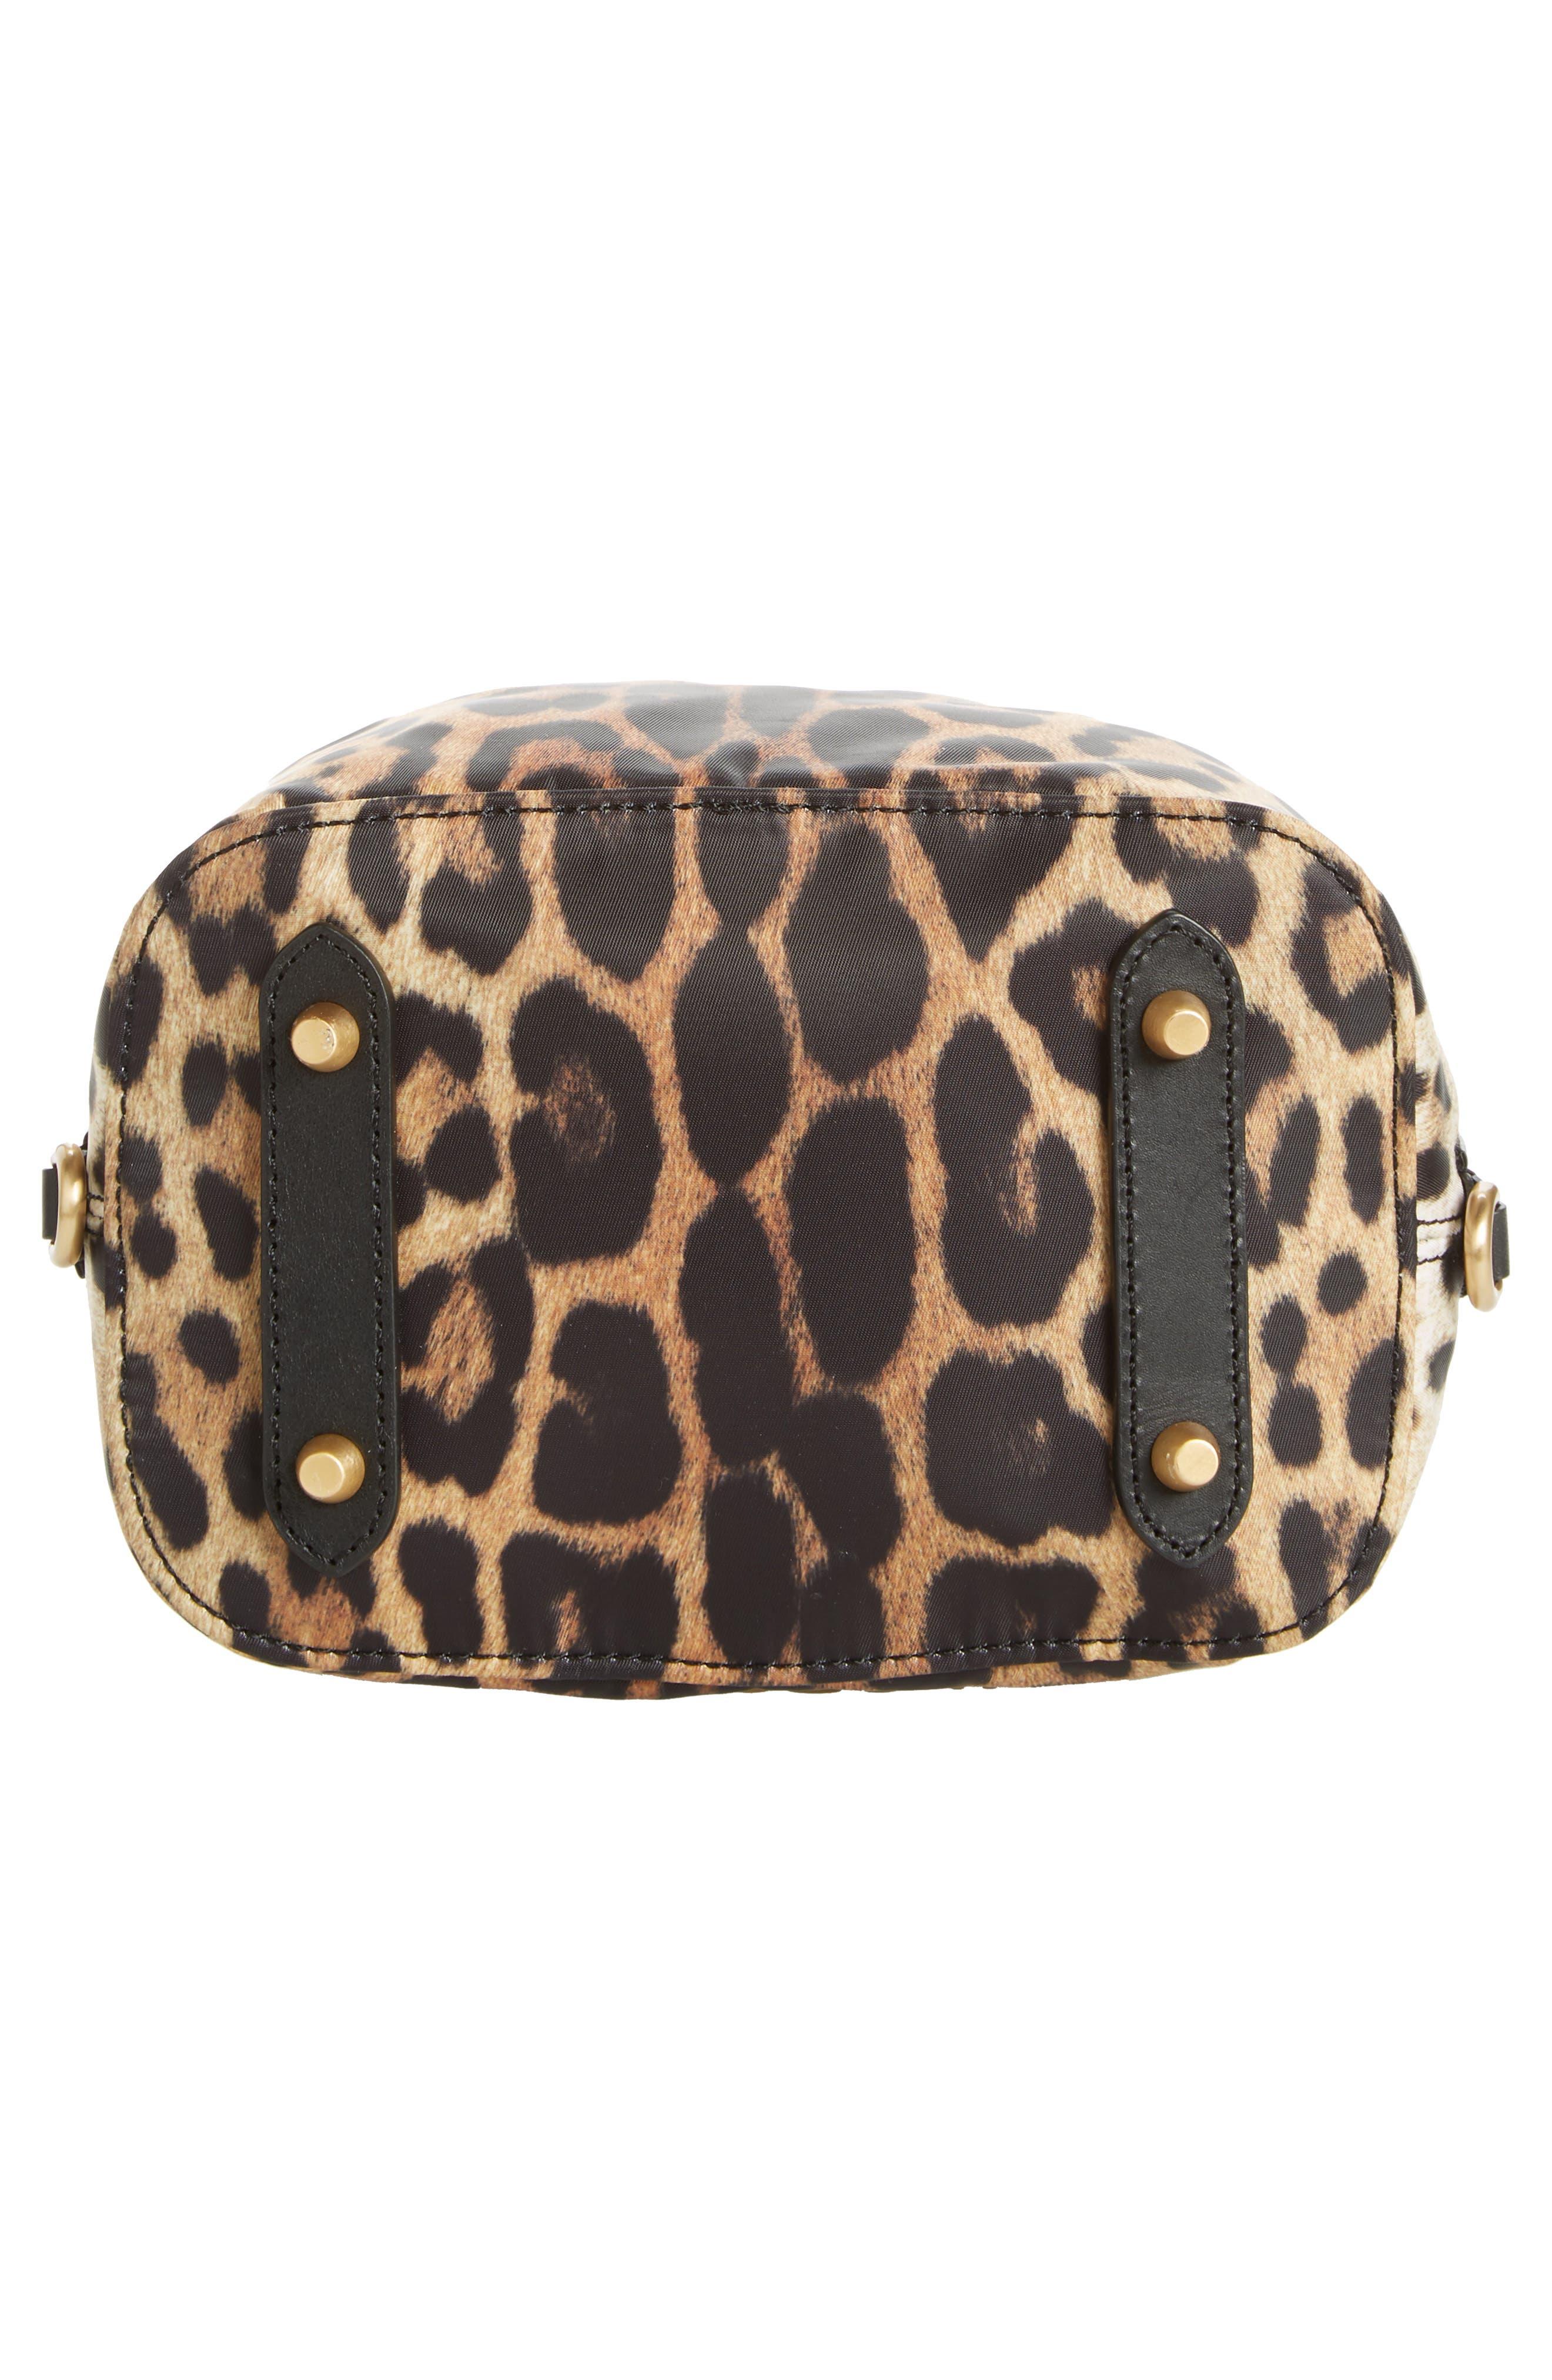 MOSCHINO, Leopard Print Nylon Convertible Bucket Bag, Alternate thumbnail 7, color, BLACK